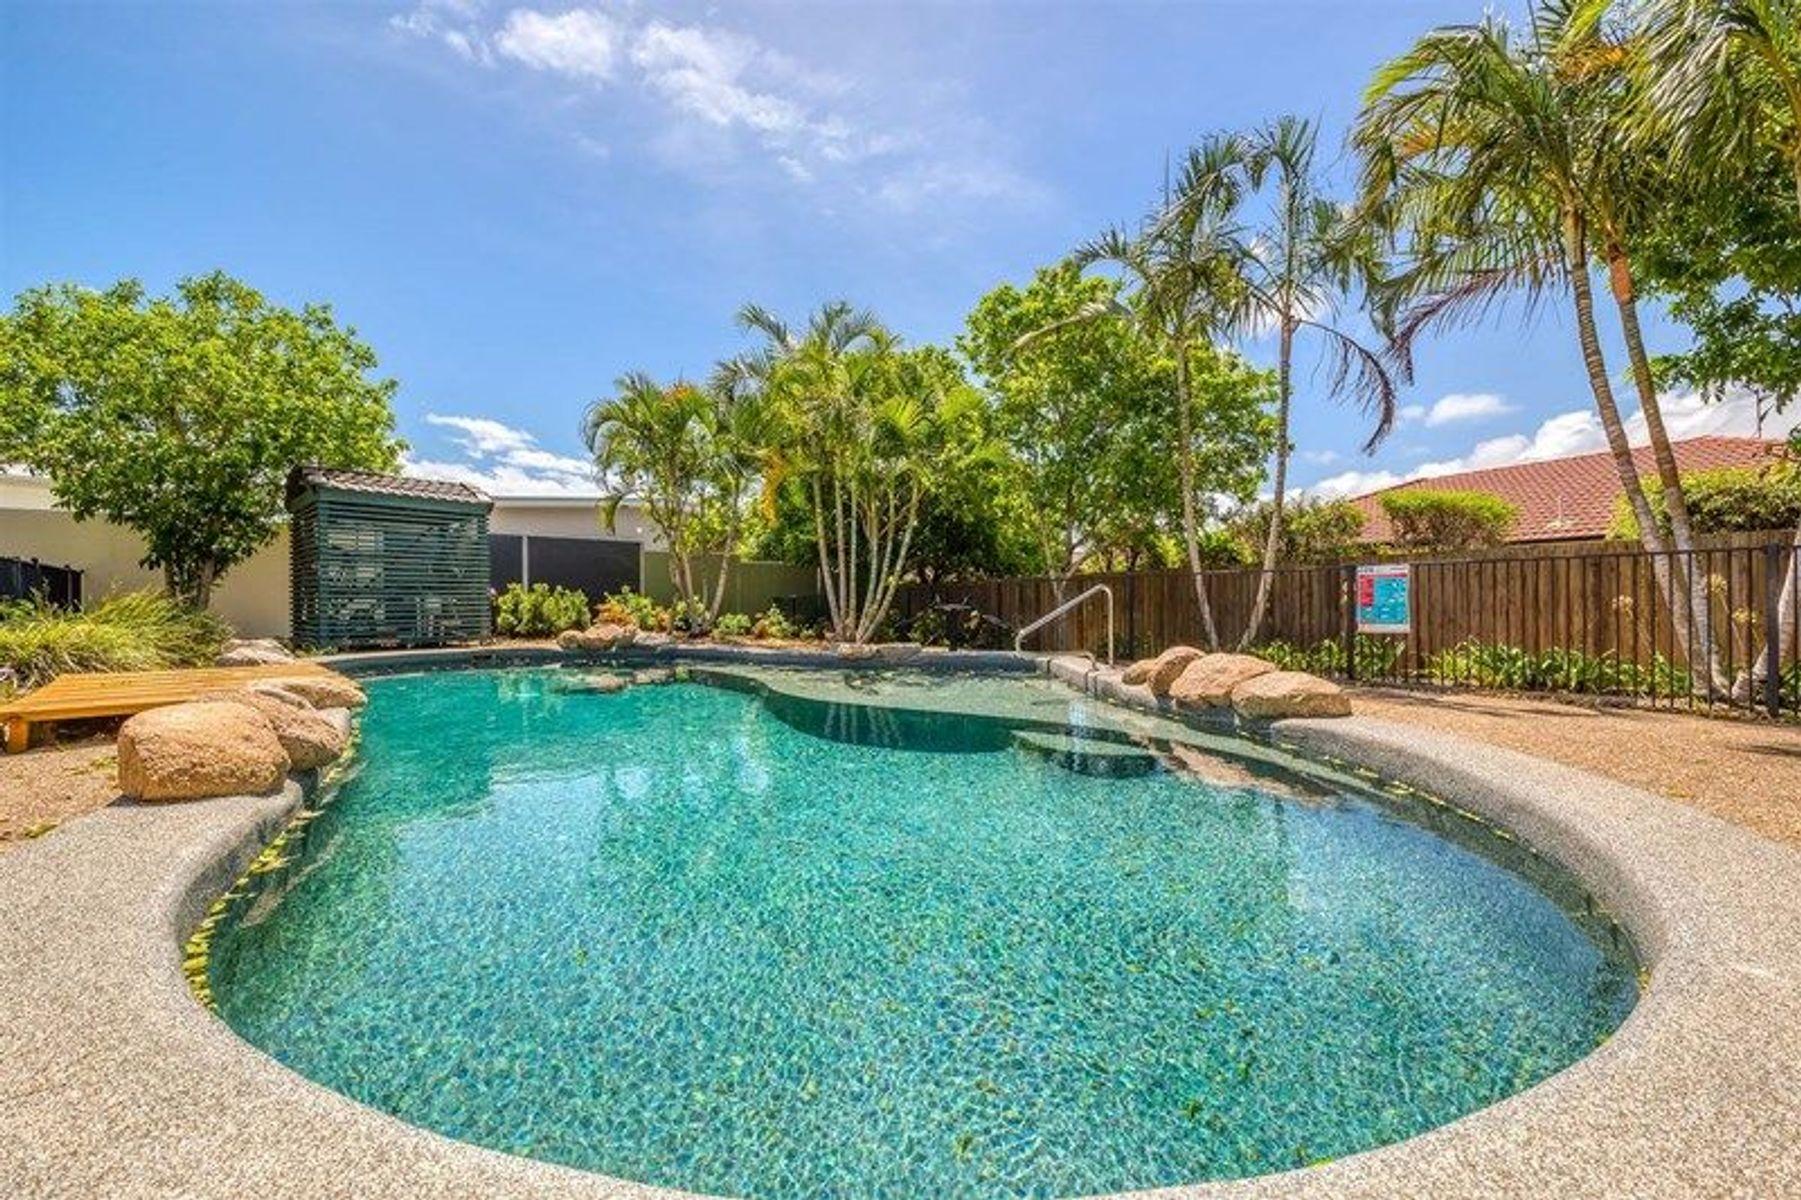 8 Seabreeze Court, Sandstone Point, QLD 4511